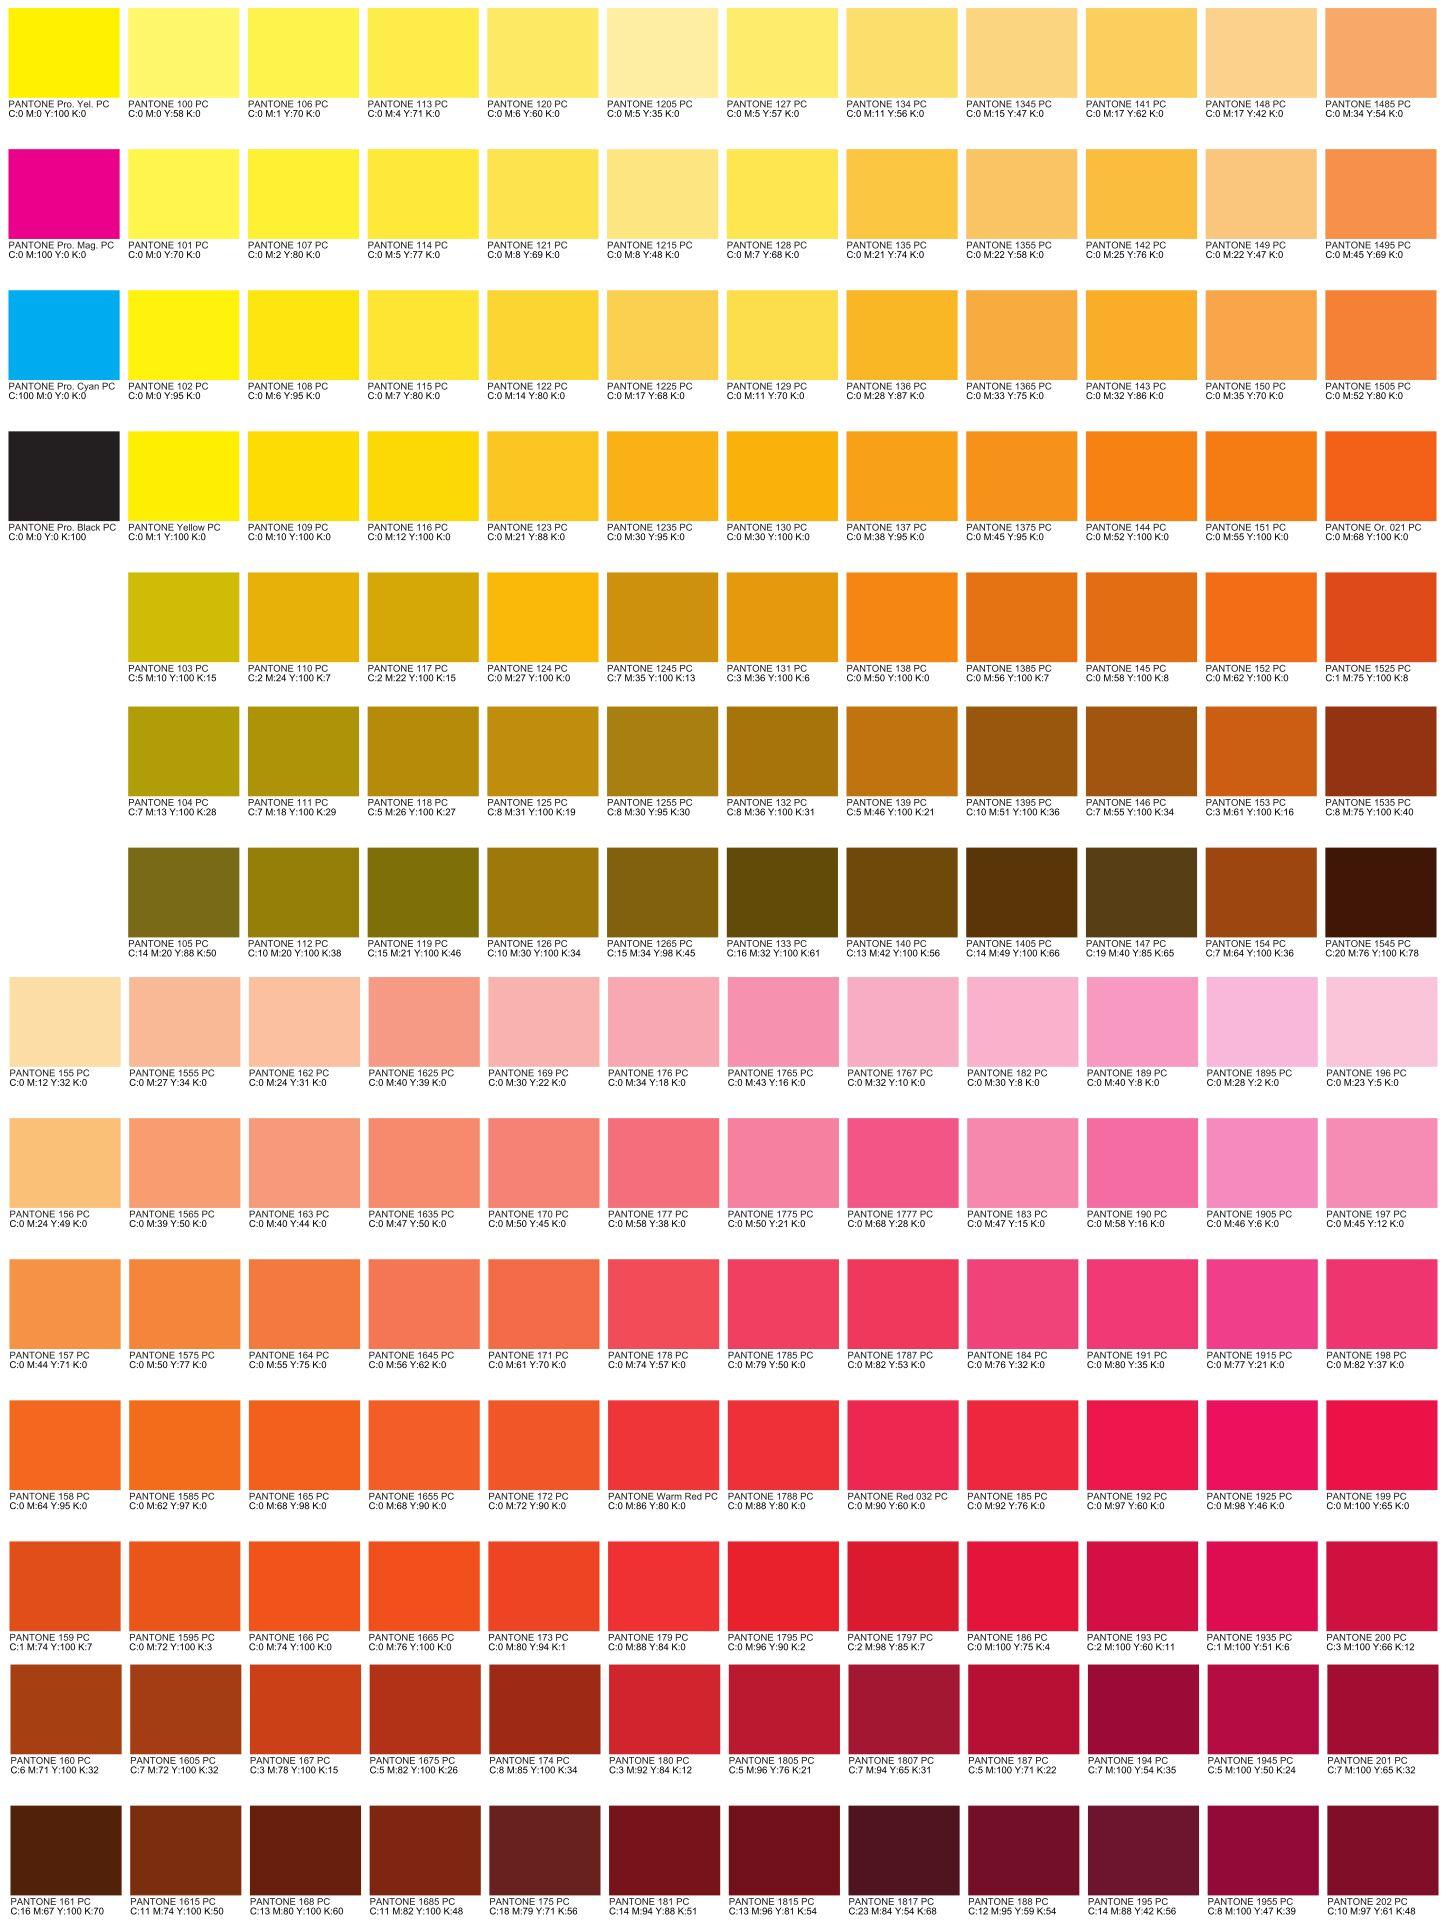 CMYK color code charts   Love my job!   Pinterest   Adobe ...